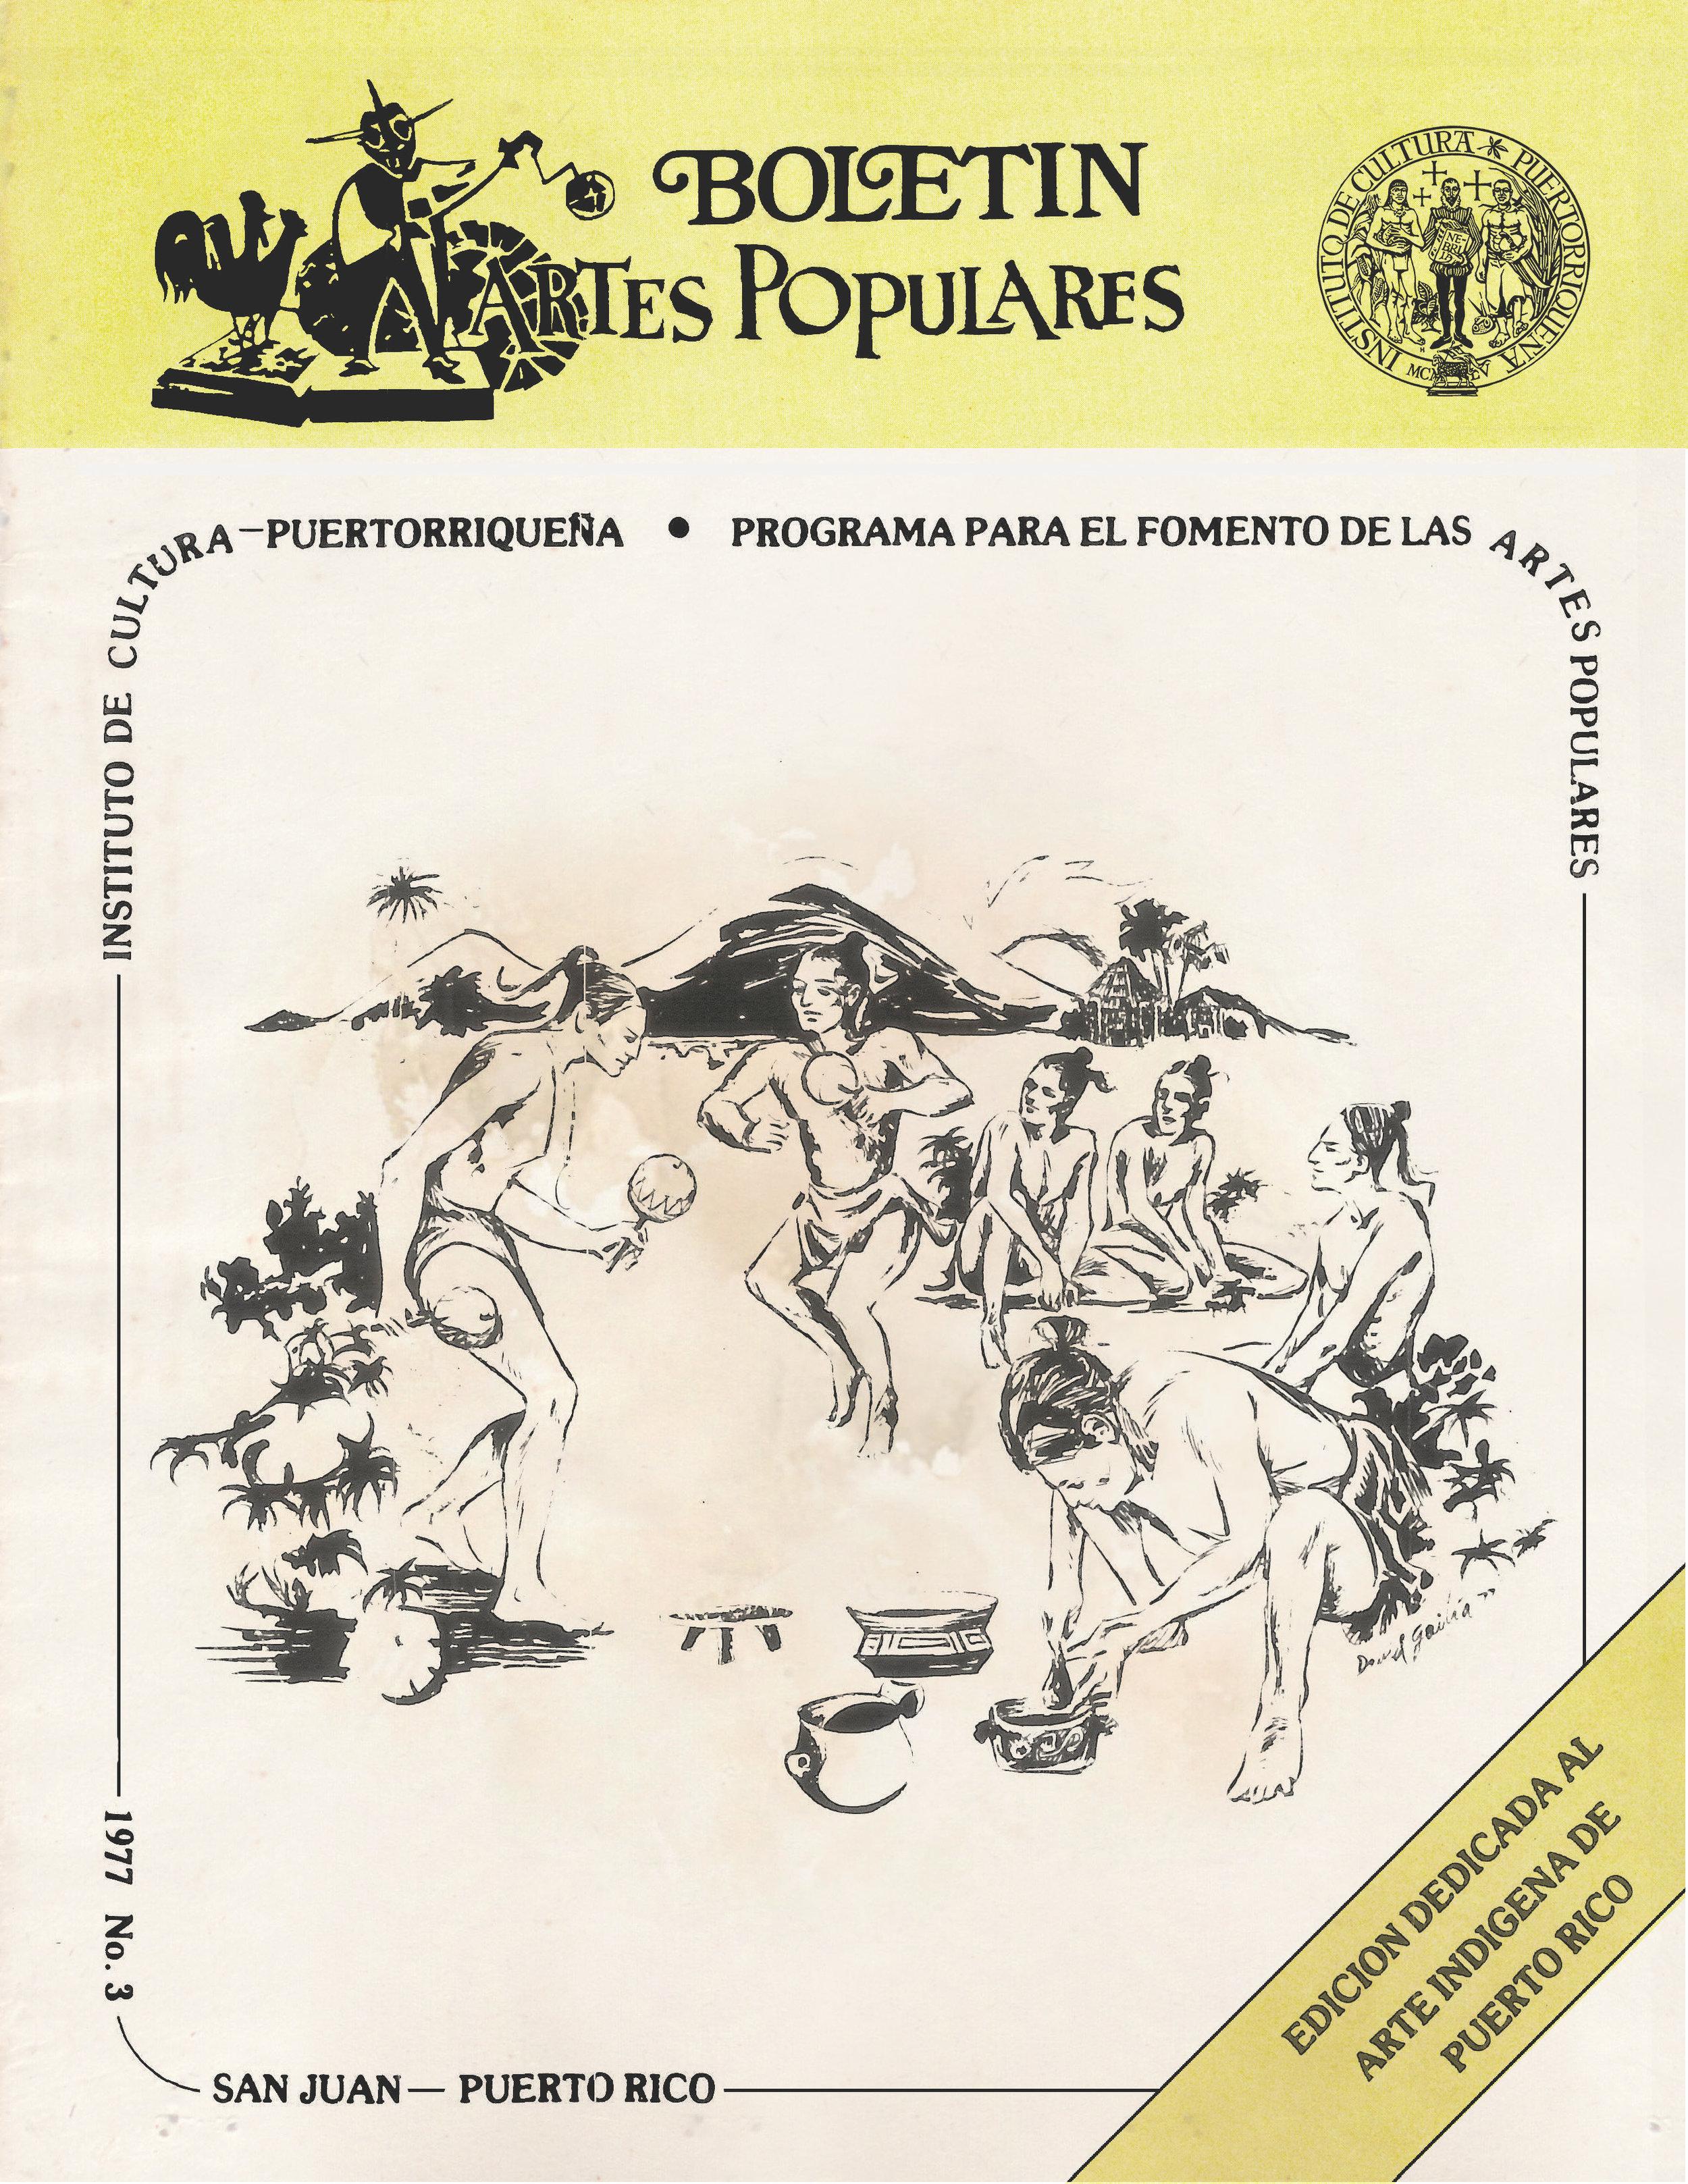 Boletín de Artes Populares #3.jpg